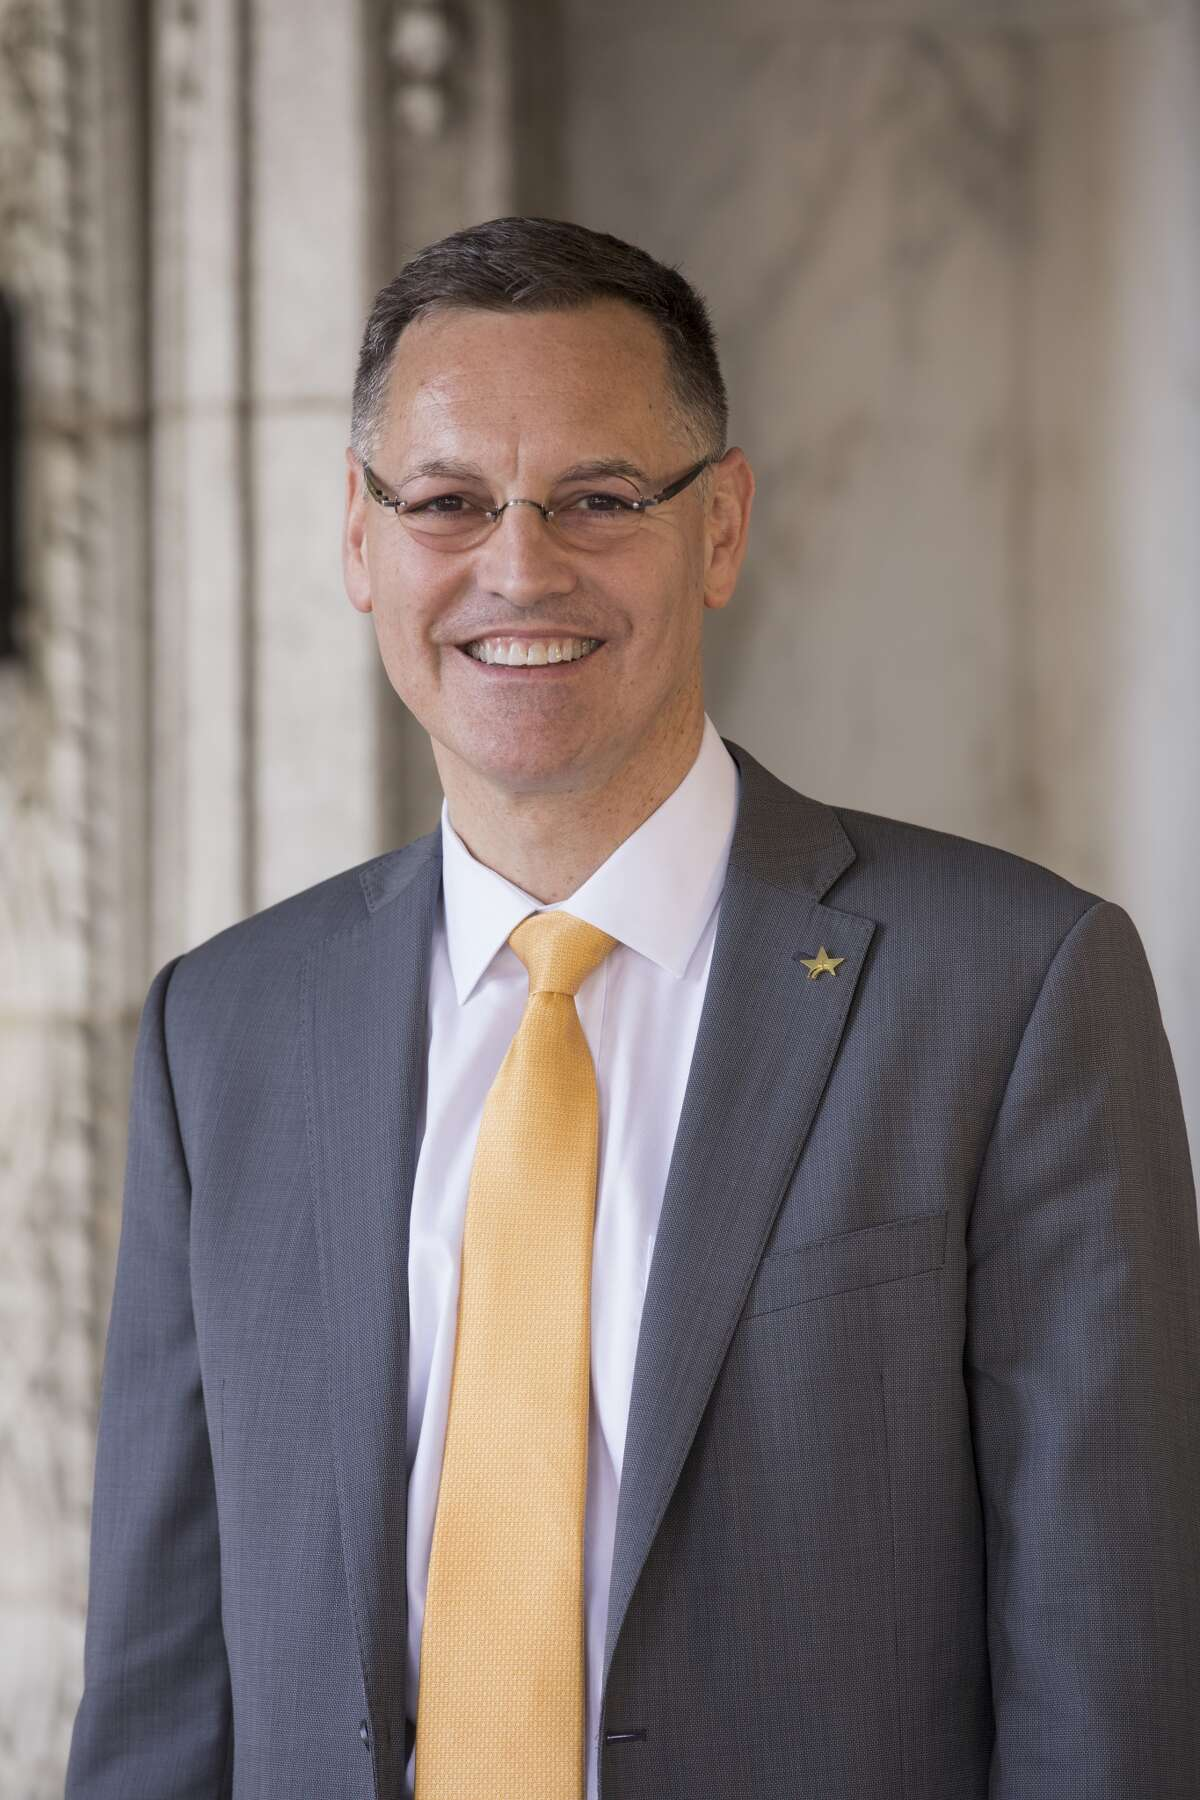 Richard Ludwick is president of the University of St. Thomas in Houston.